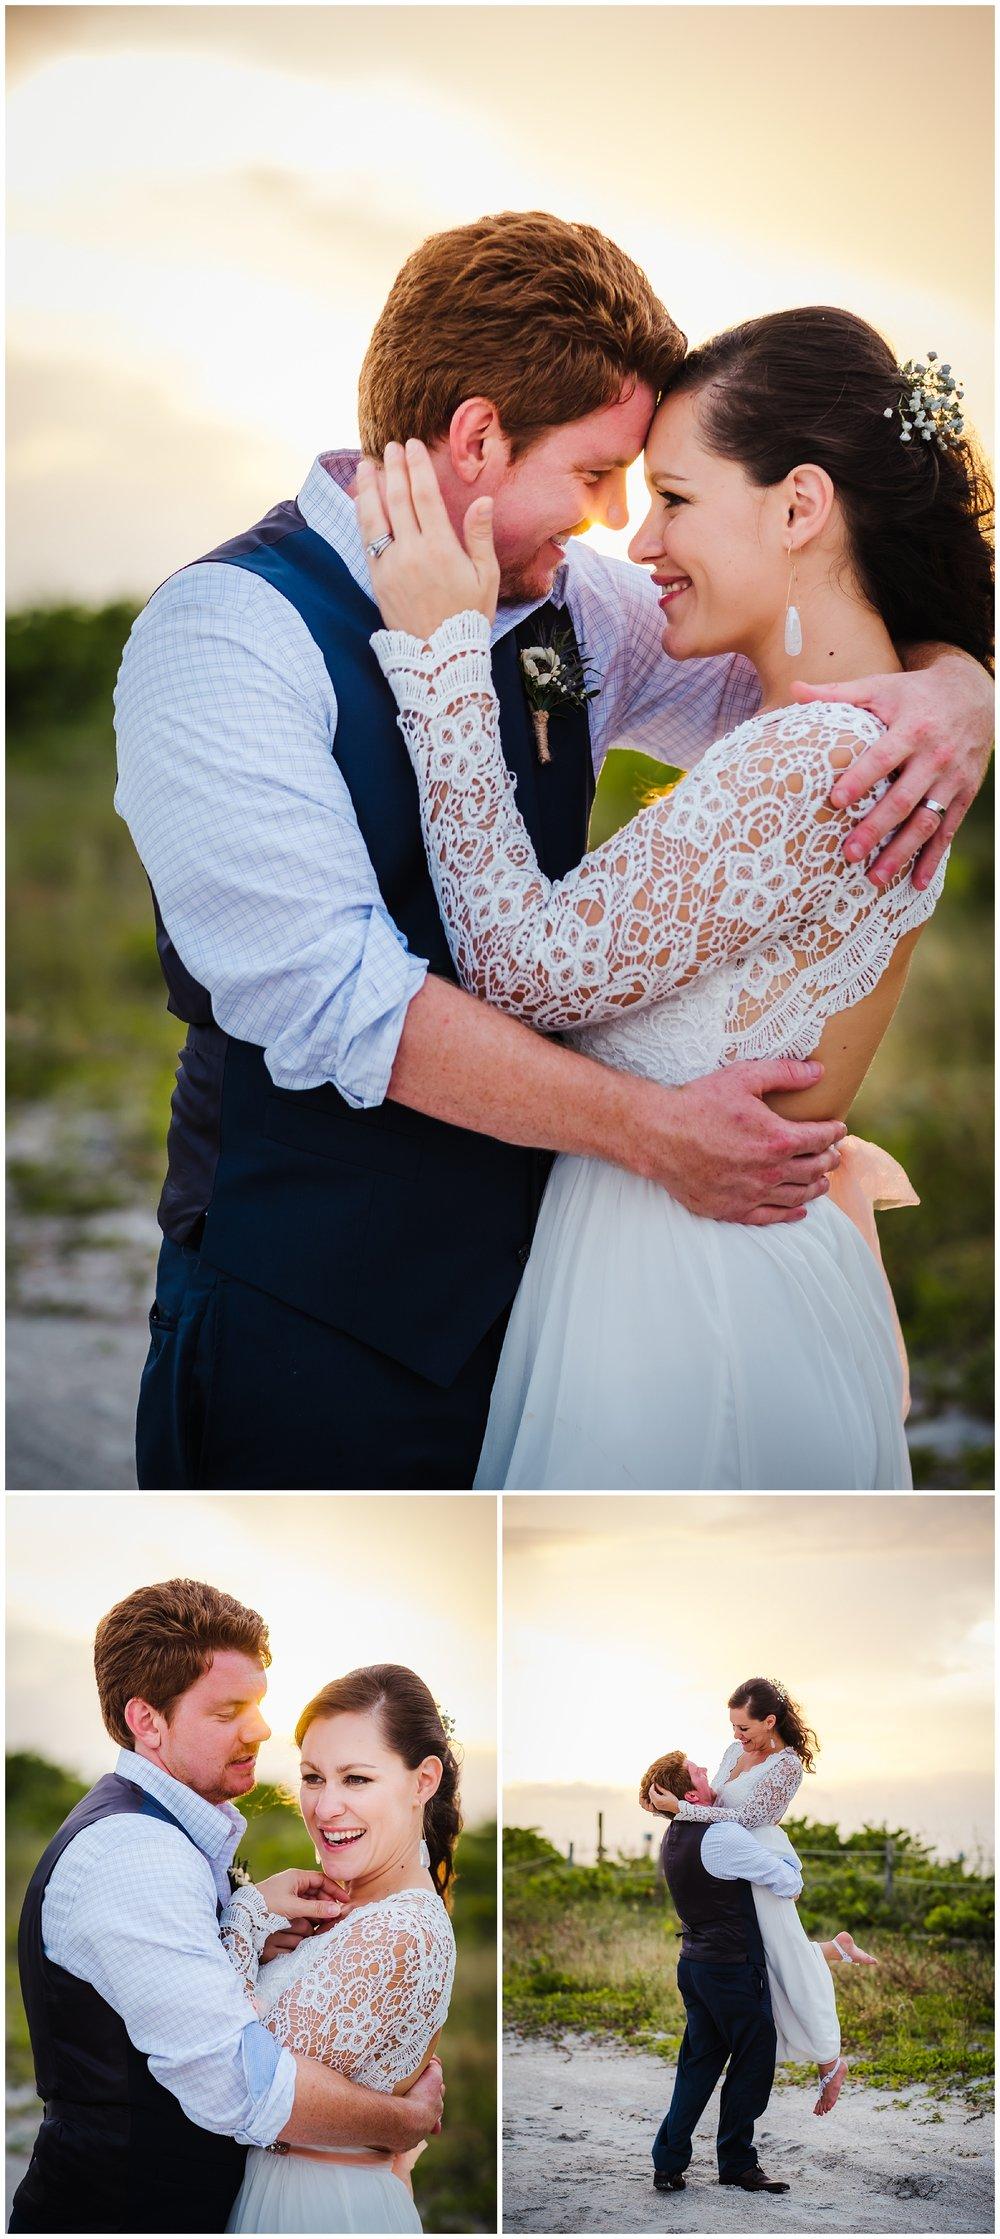 st-pete-wedding-photographer-postcard-inn-sleeve-dress-rain-sunset_0206.jpg